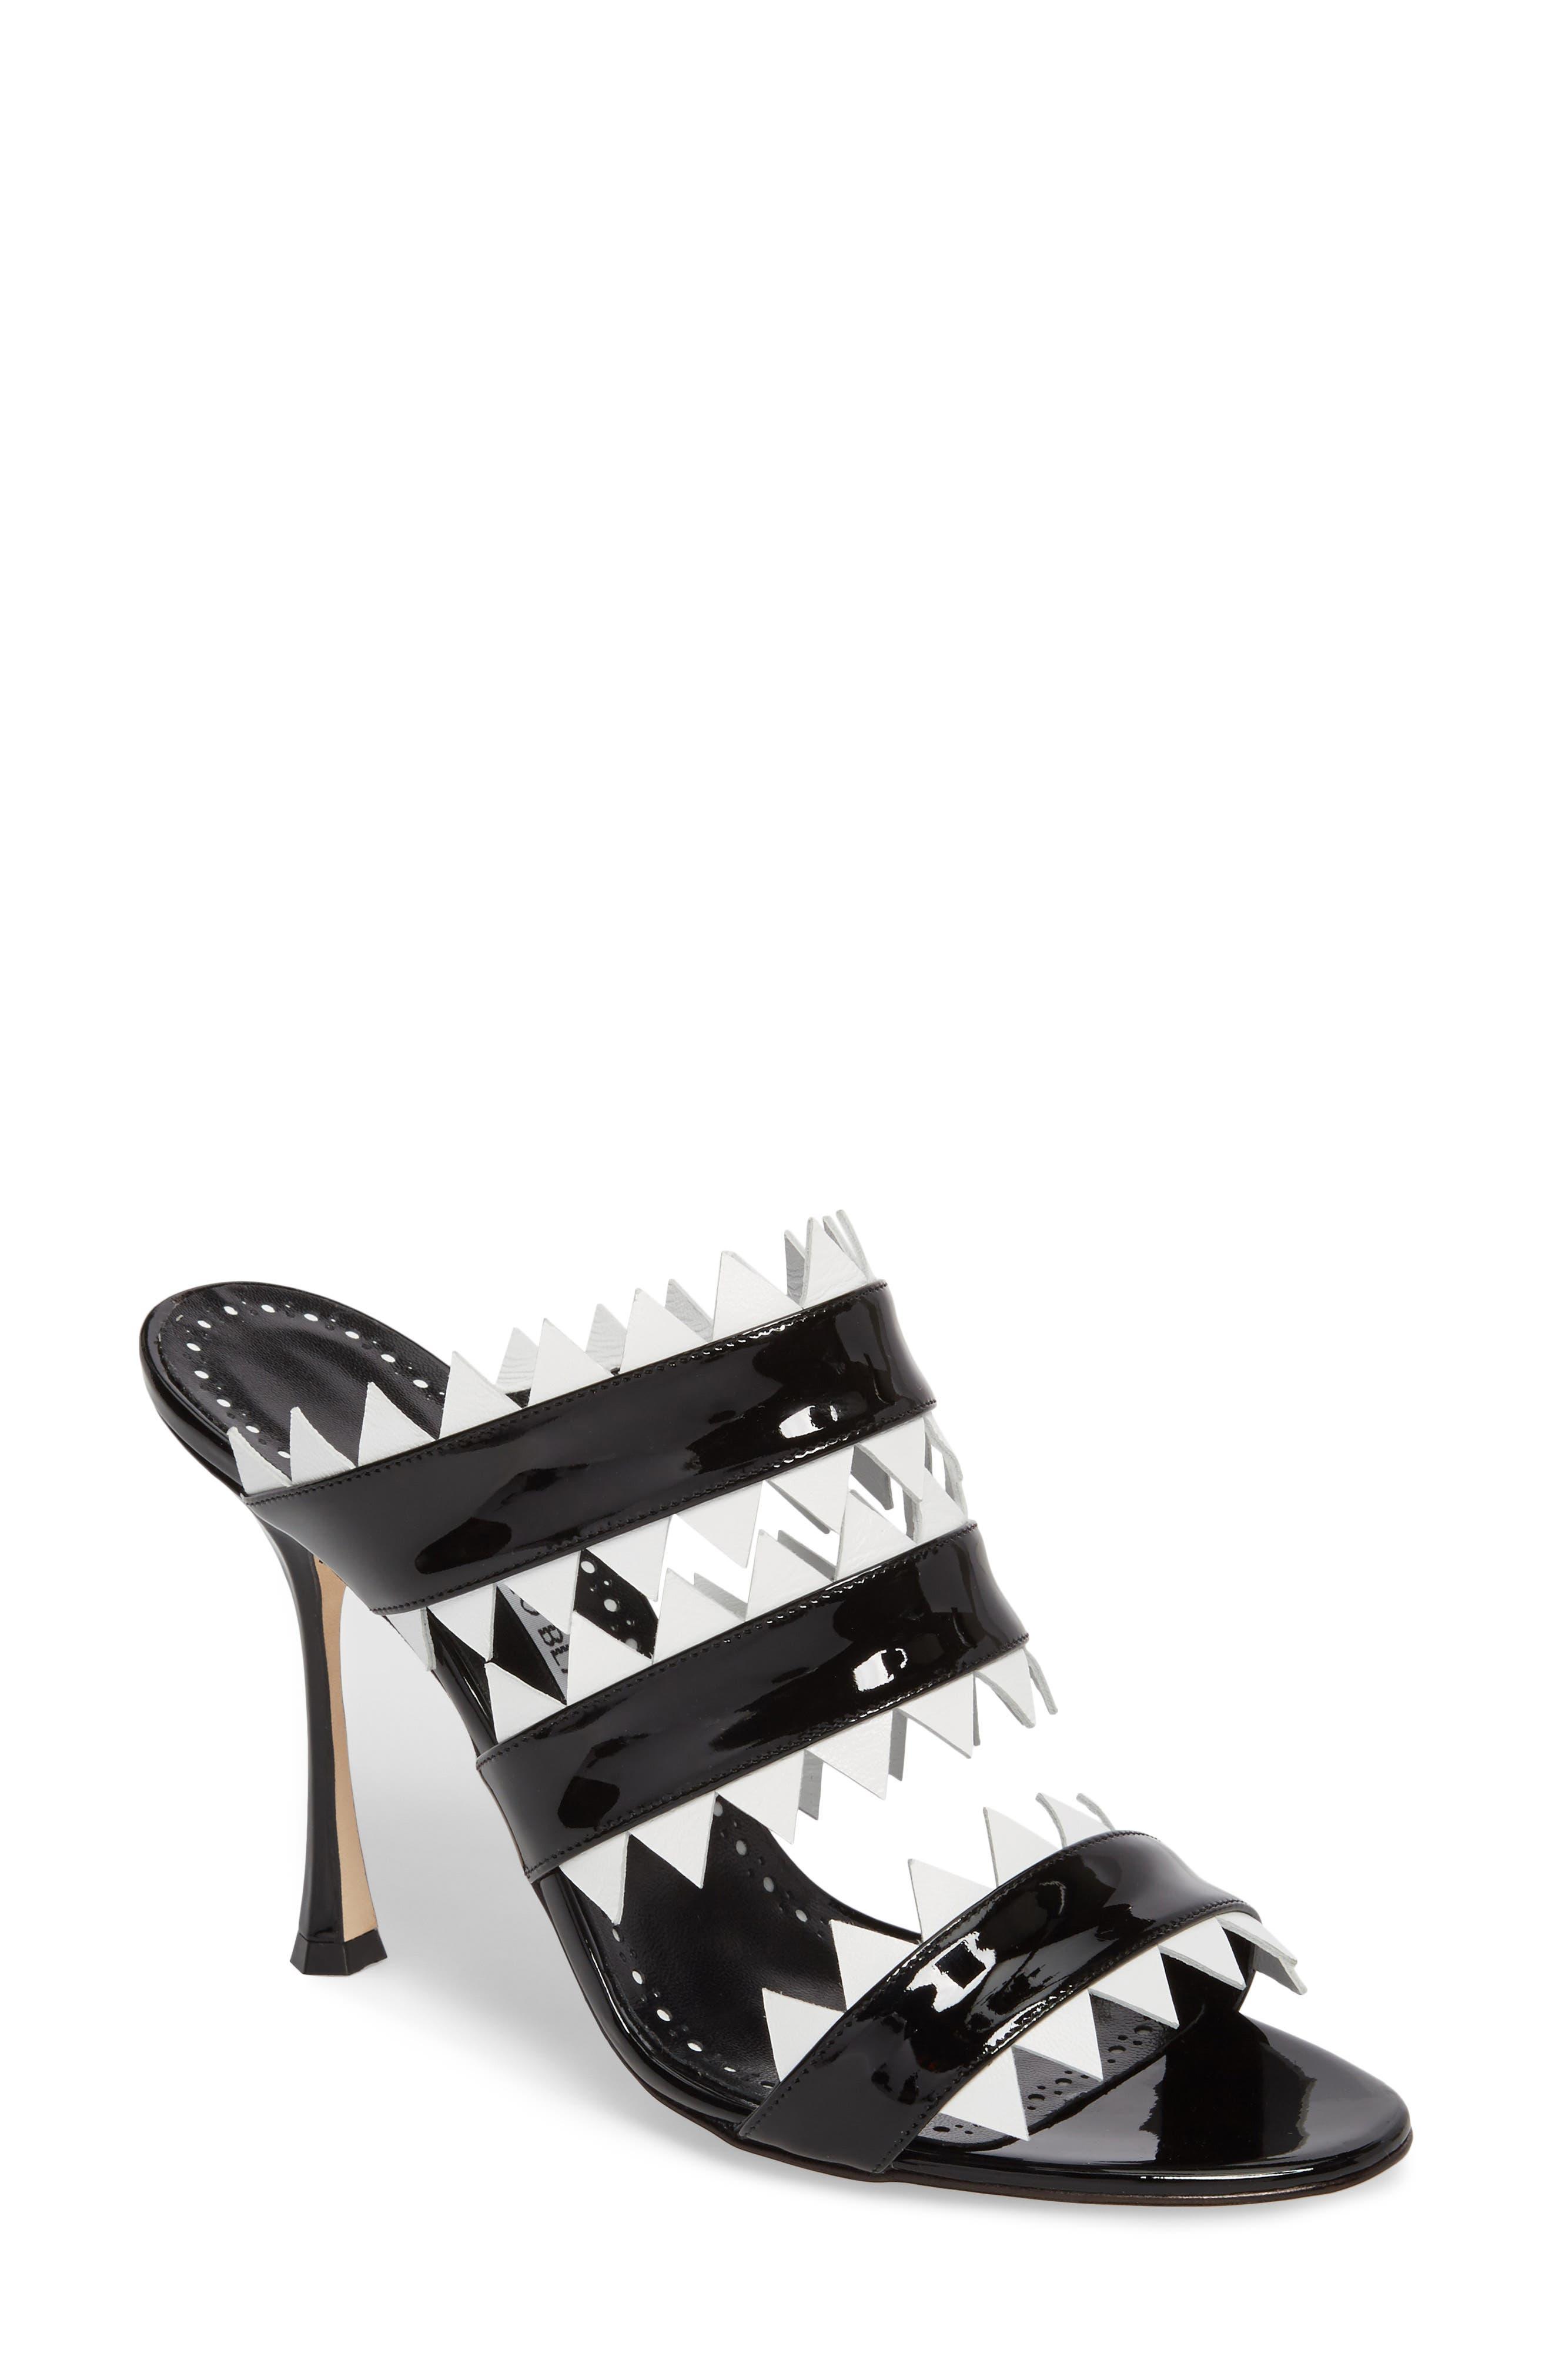 Arpege Mule Sandal,                         Main,                         color, Black/ White